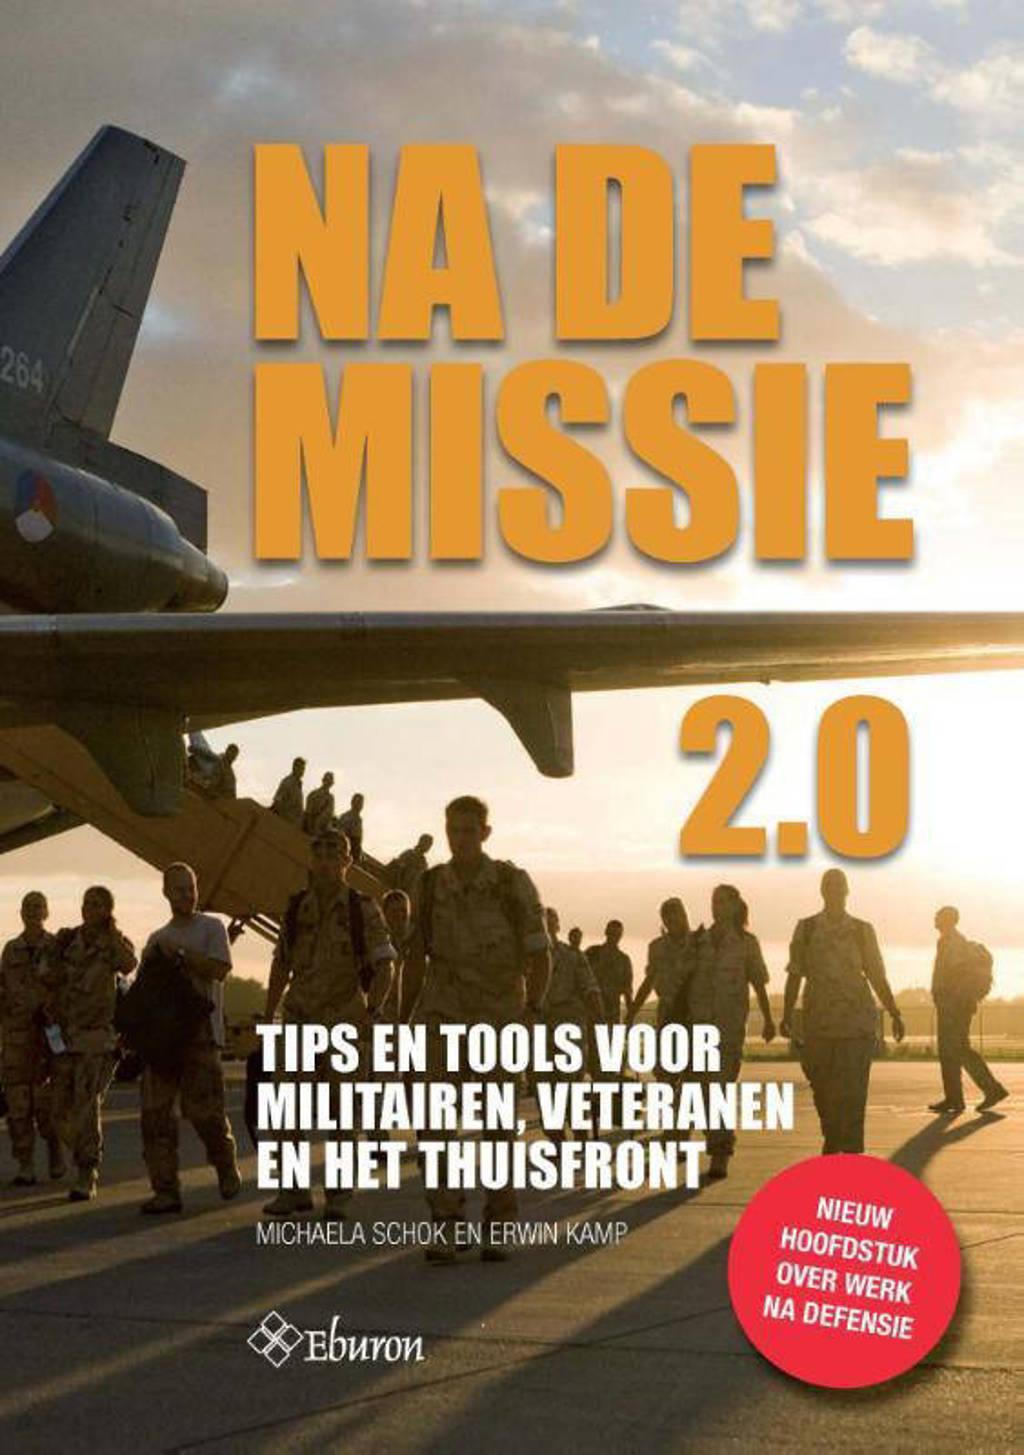 Na de missie 2.0 - Michaela Schok en Erwin Kamp